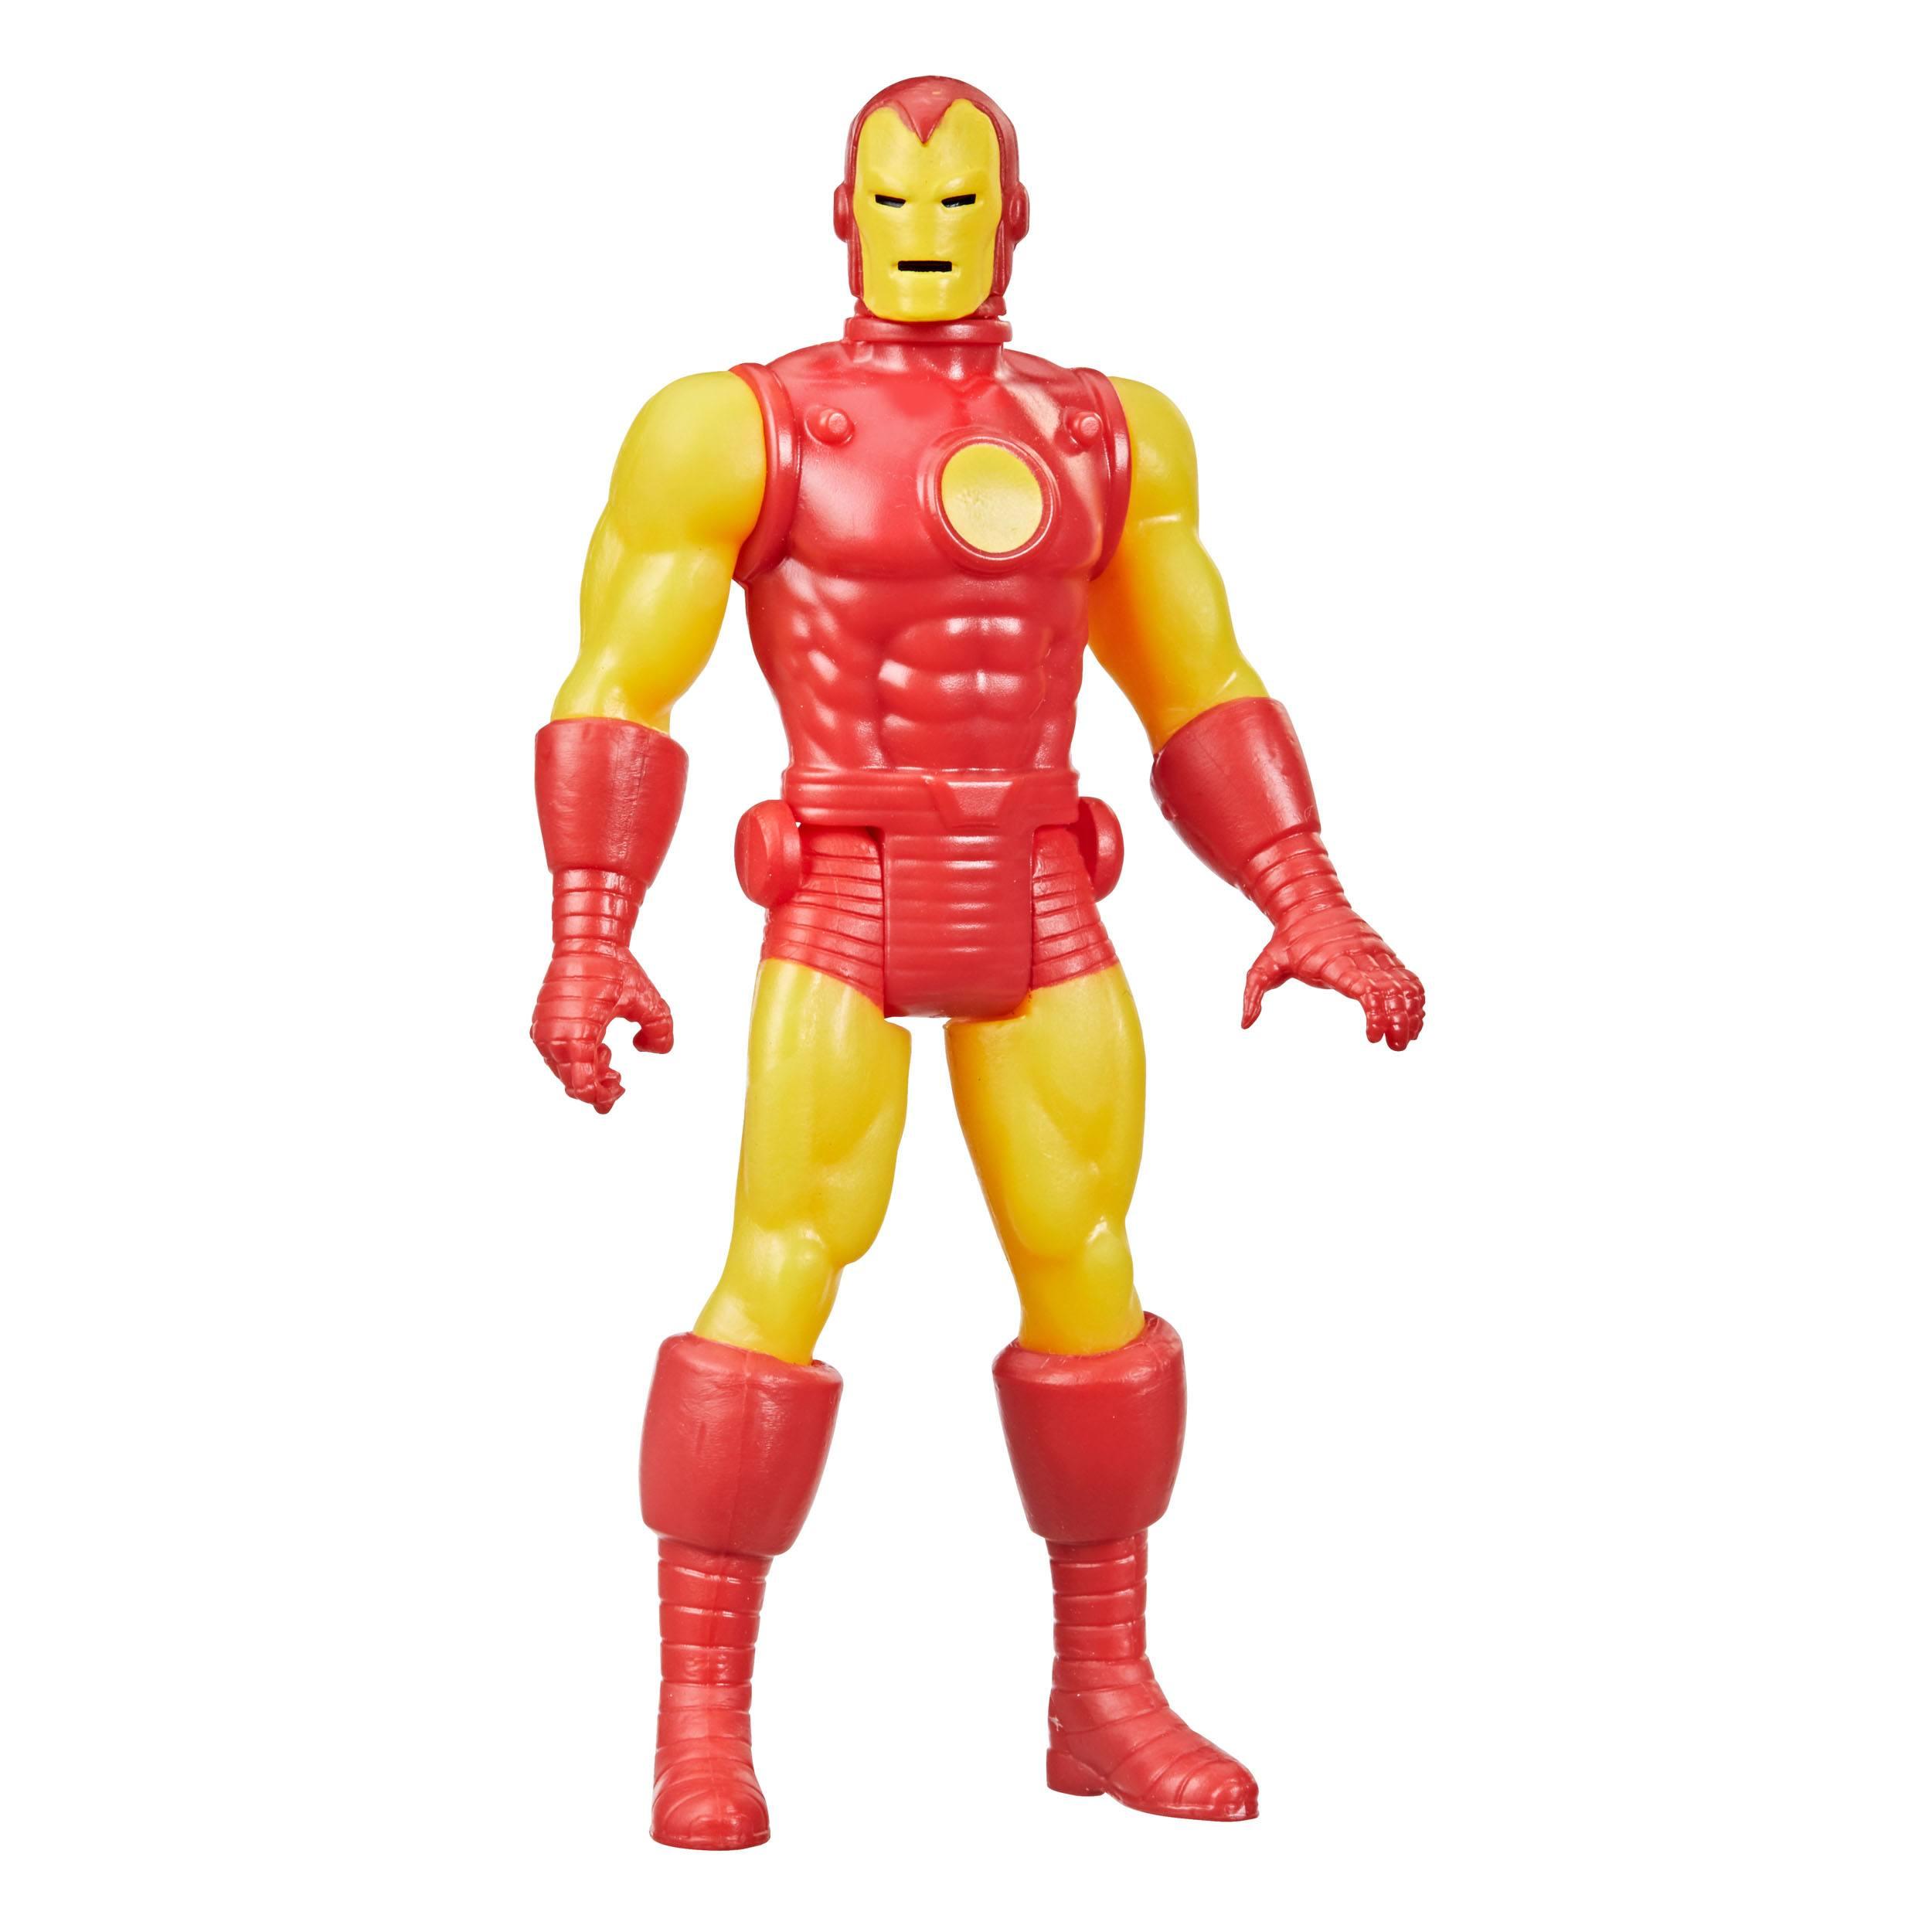 Marvel Legends Retro 375 Collection Iron Man F2656